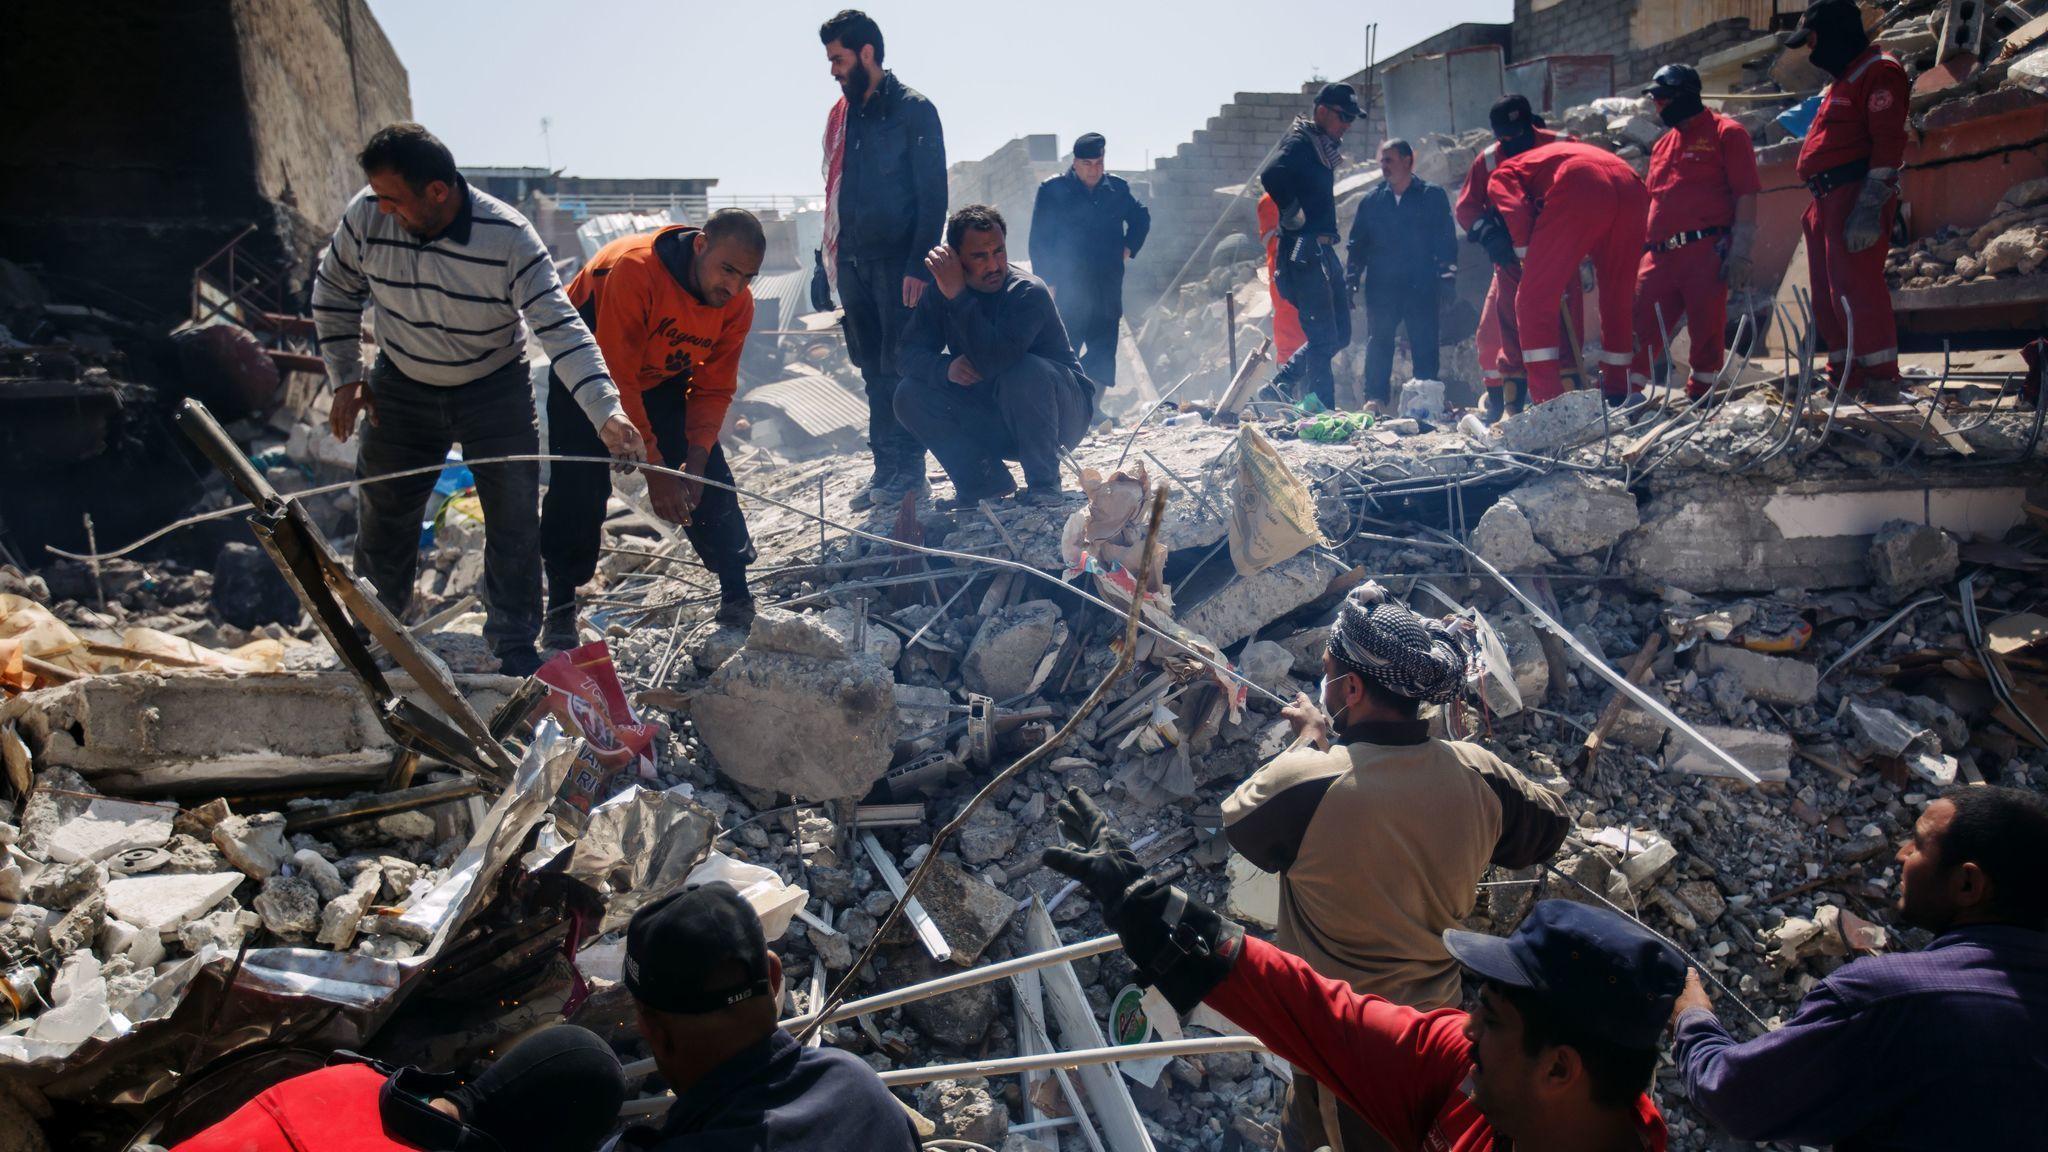 U.S. acknowledges airstrike in Mosul, where more than 200 Iraqi civilians died